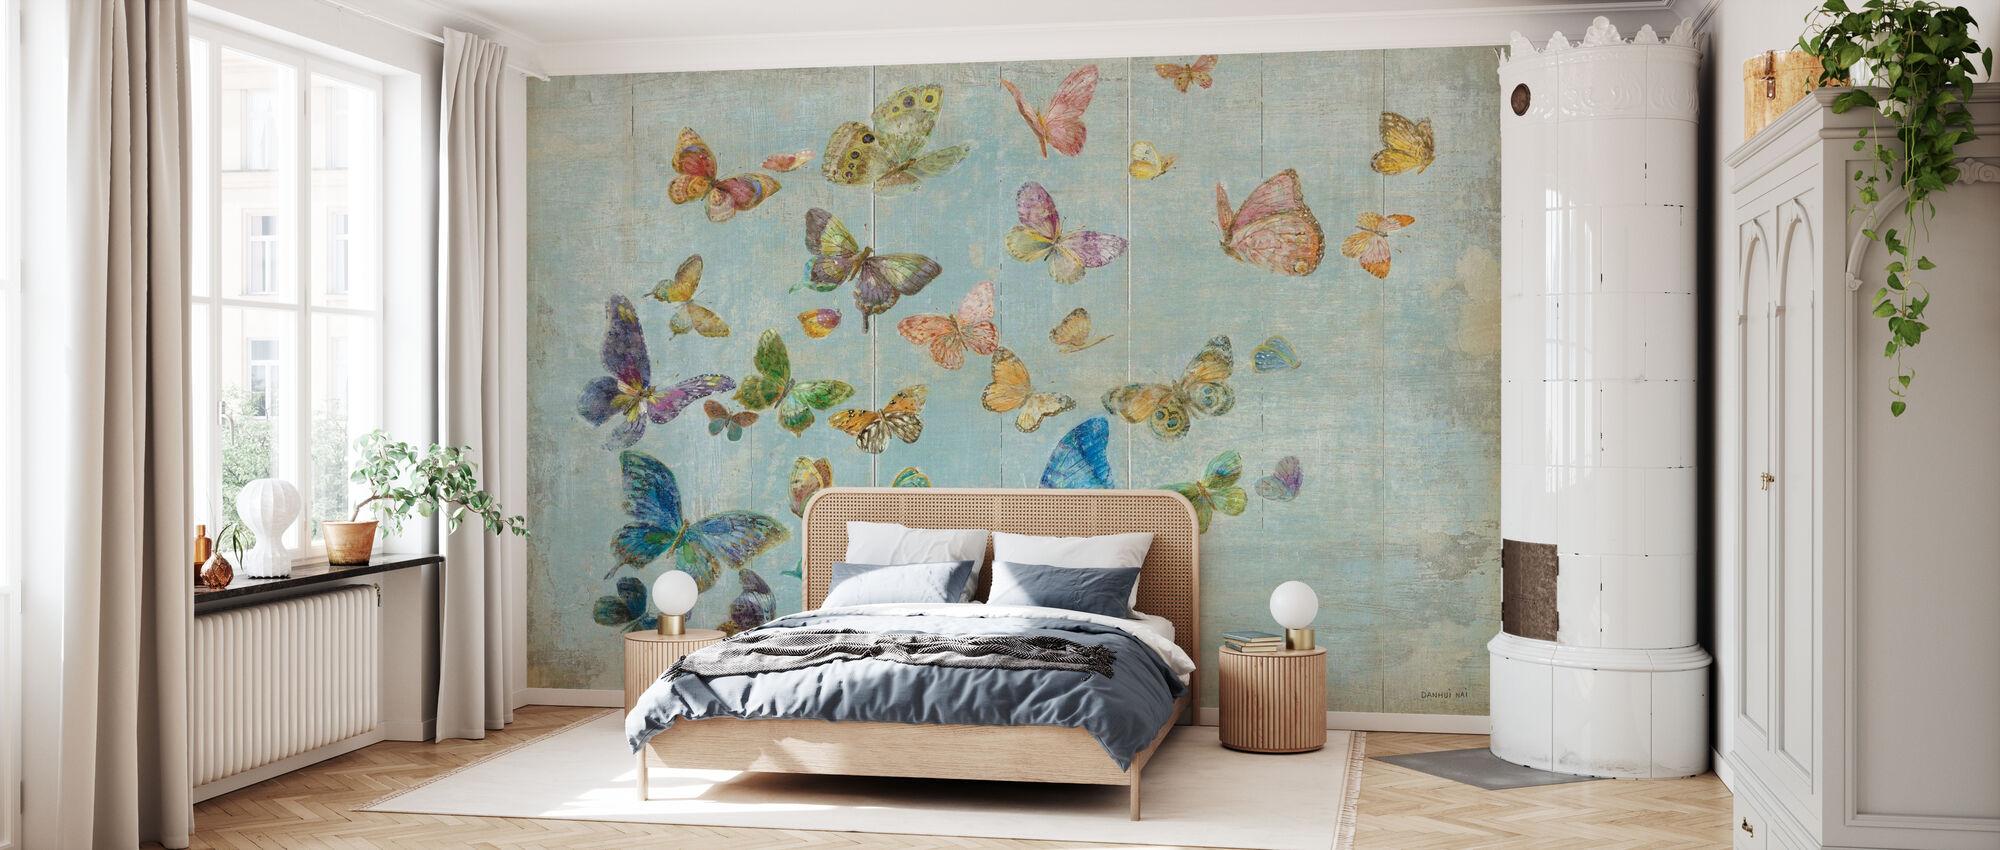 Fjärilar - Tapet - Sovrum